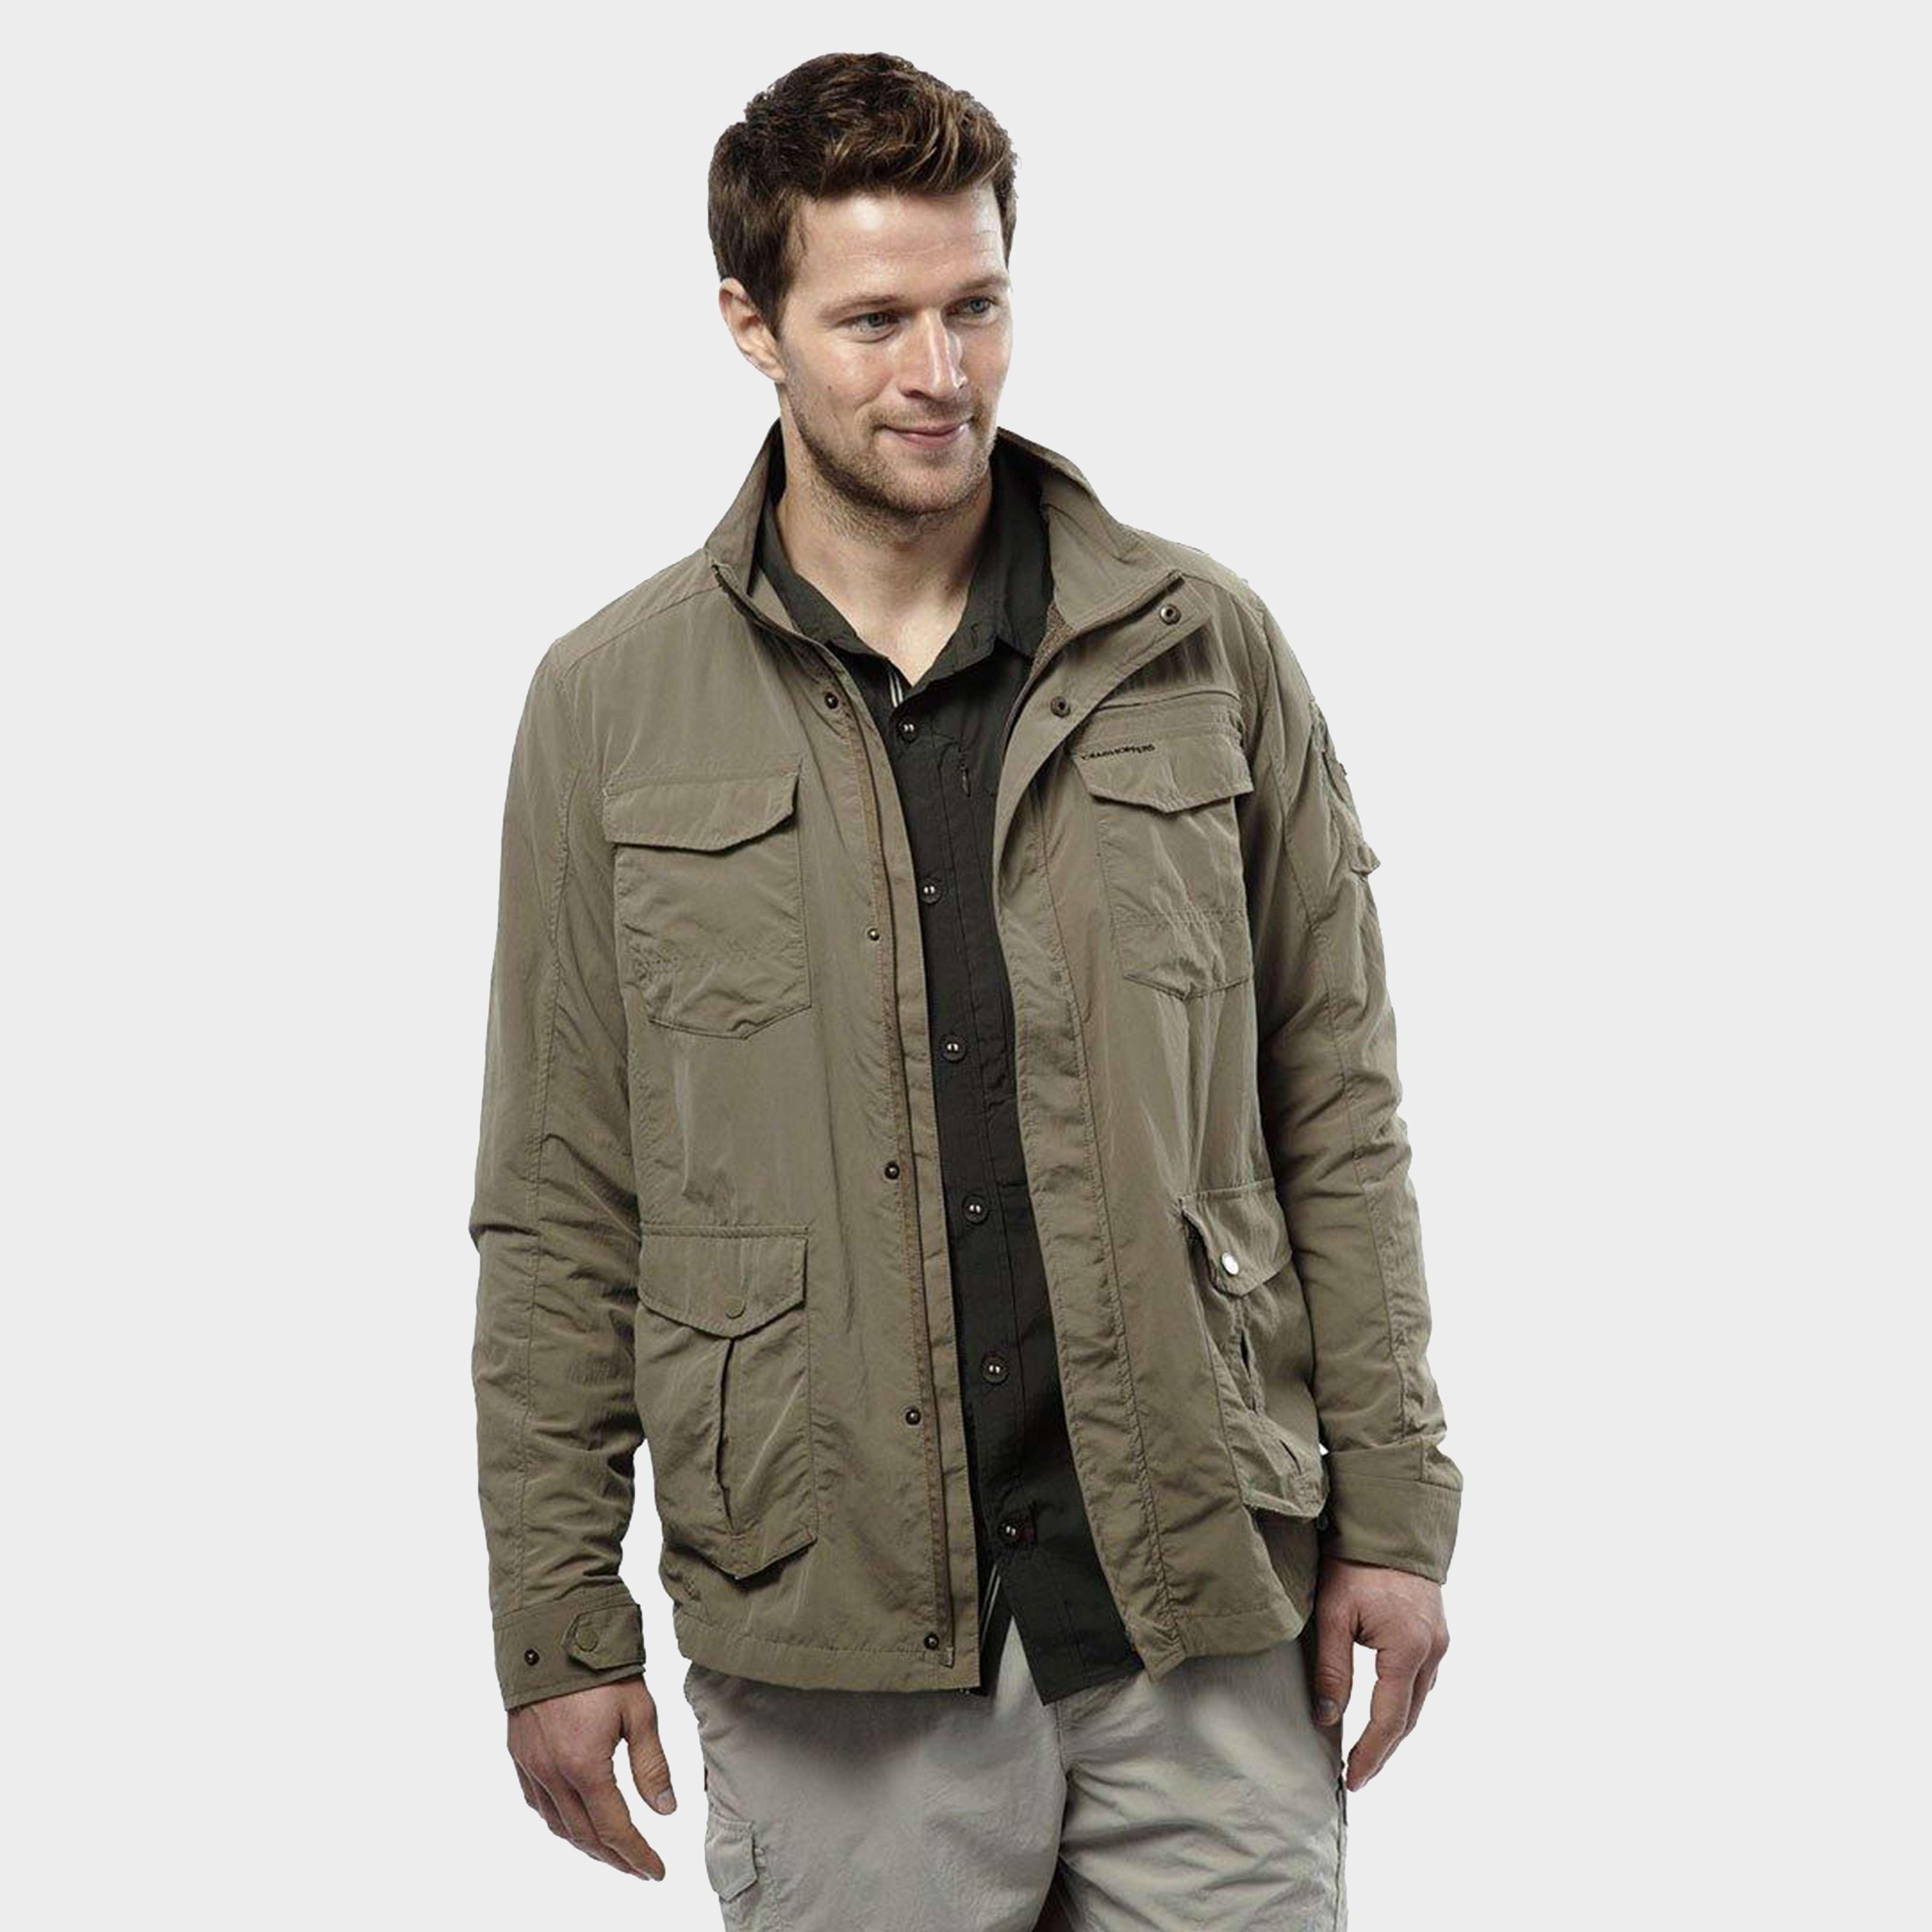 CRAGHOPPERS Men's Adventure Jacket